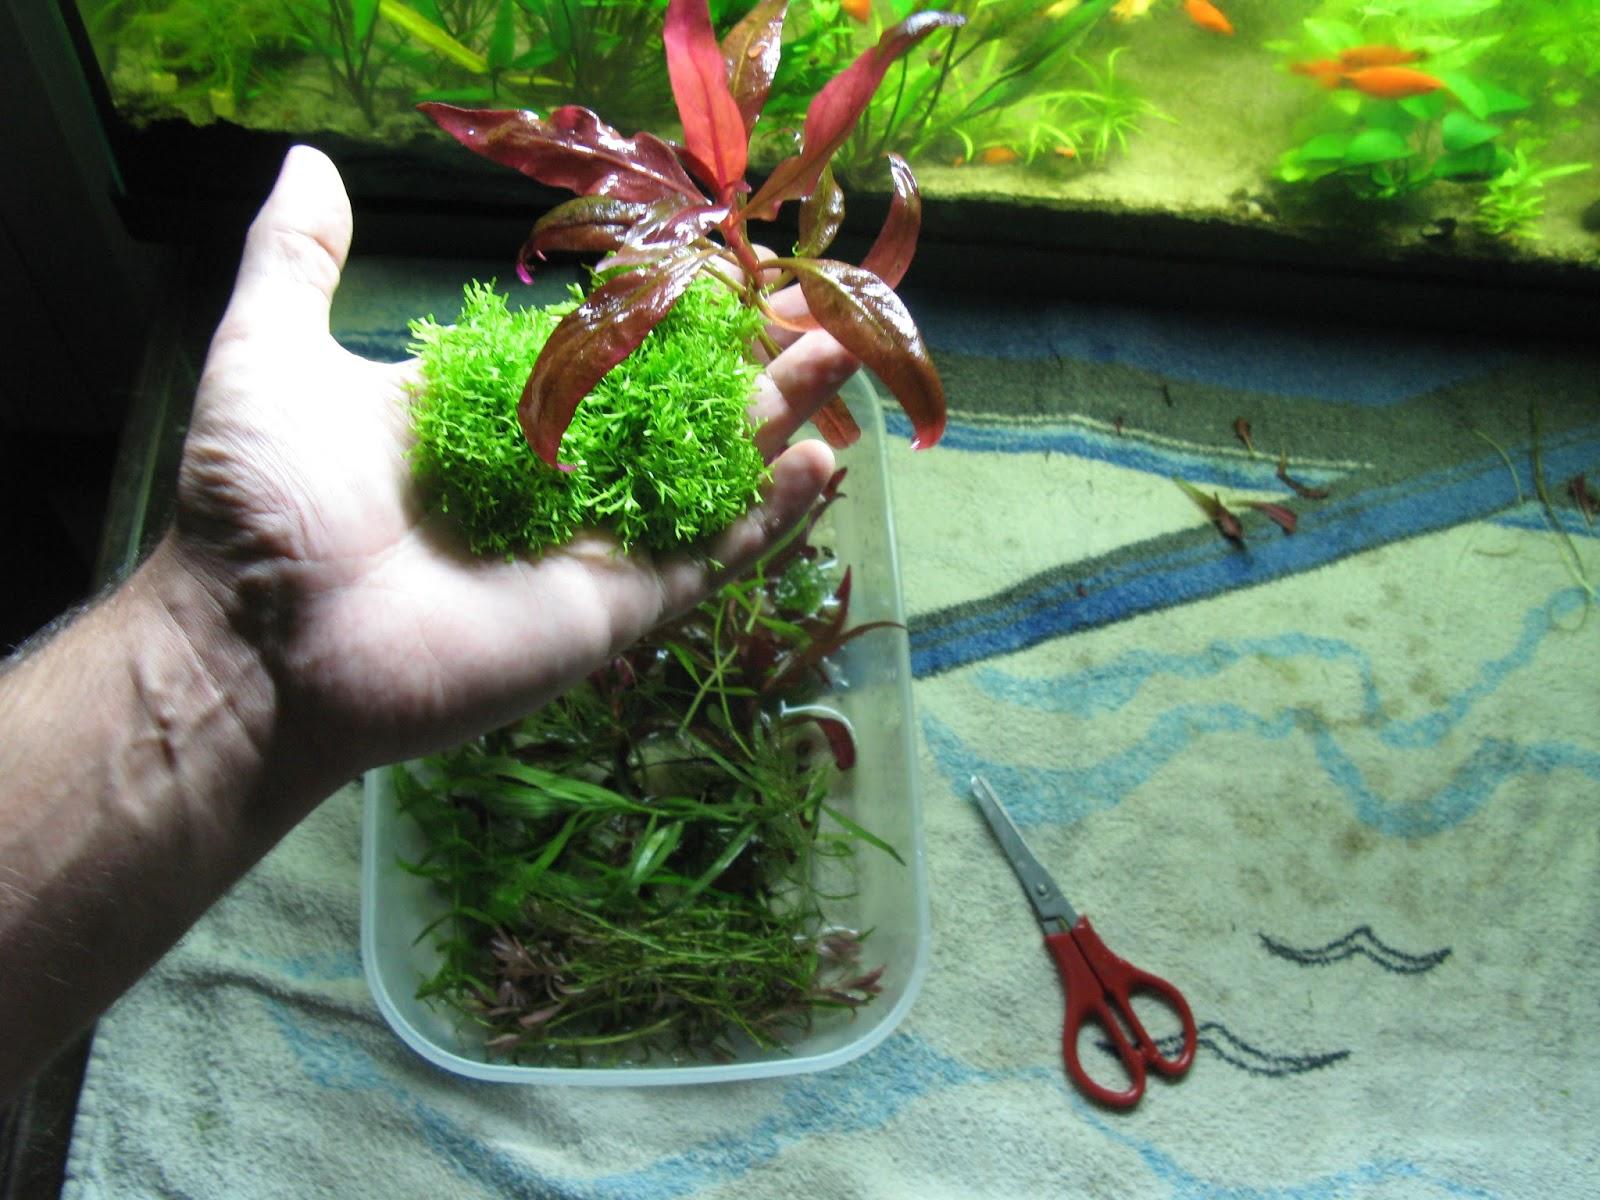 plexiglass per acquario fai da te: bostik prodotti professionali ... - Plexiglass Per Acquario Fai Da Te